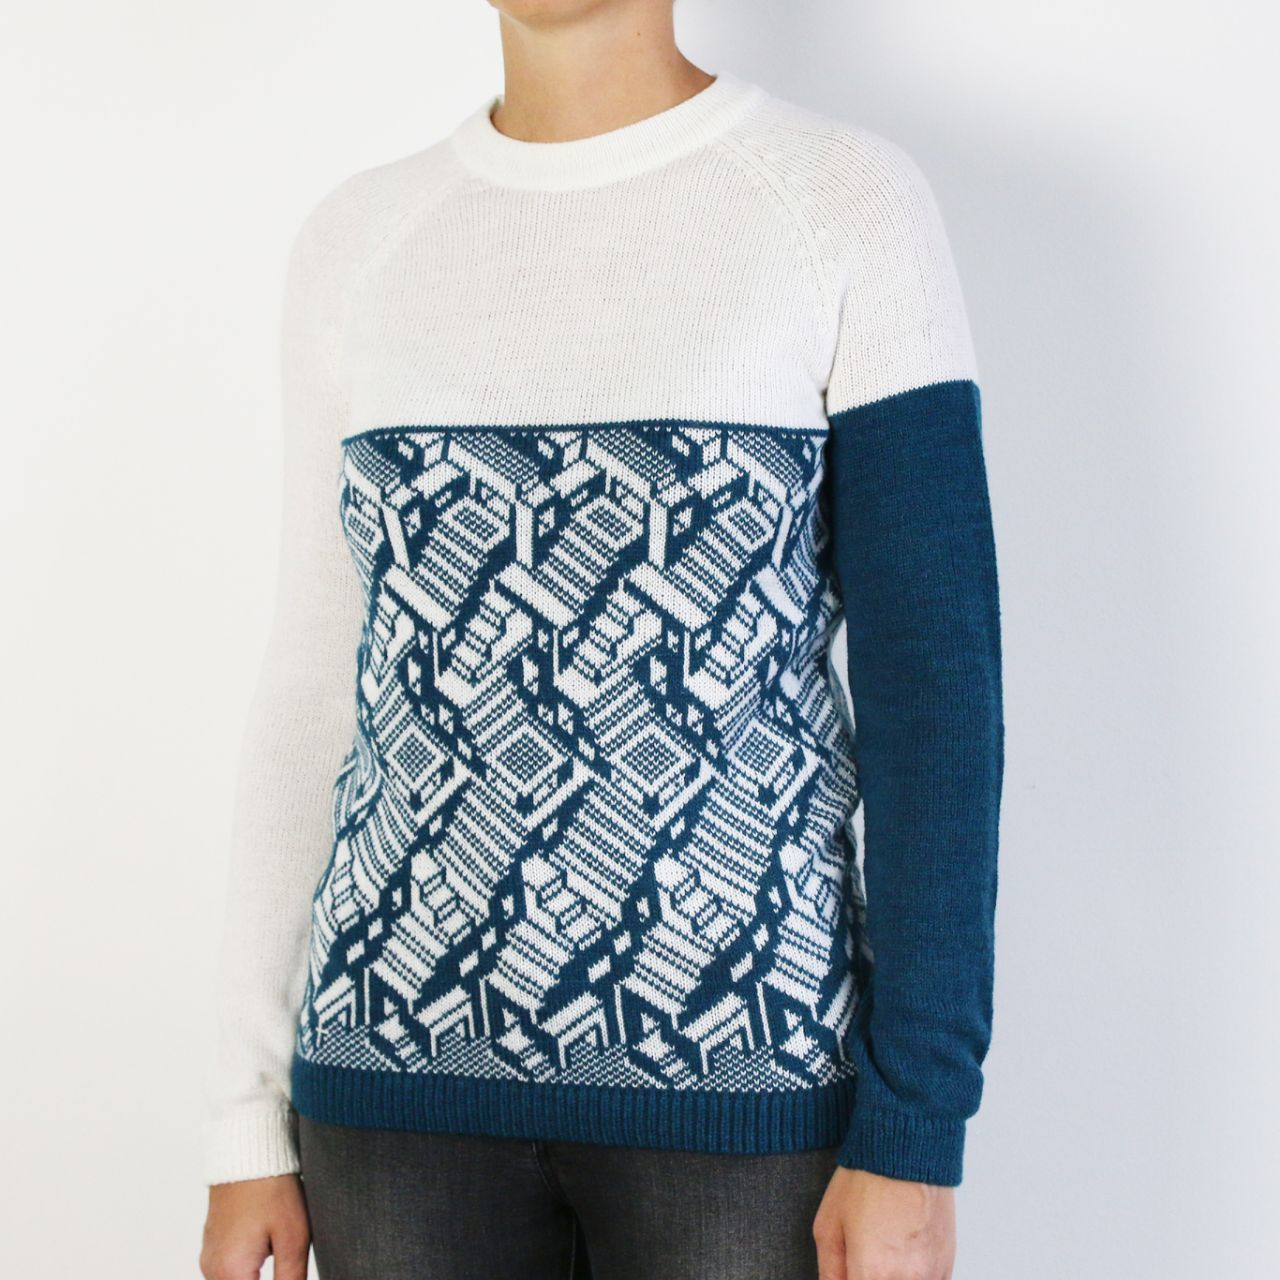 wool sweater mekoome no exit 6 1